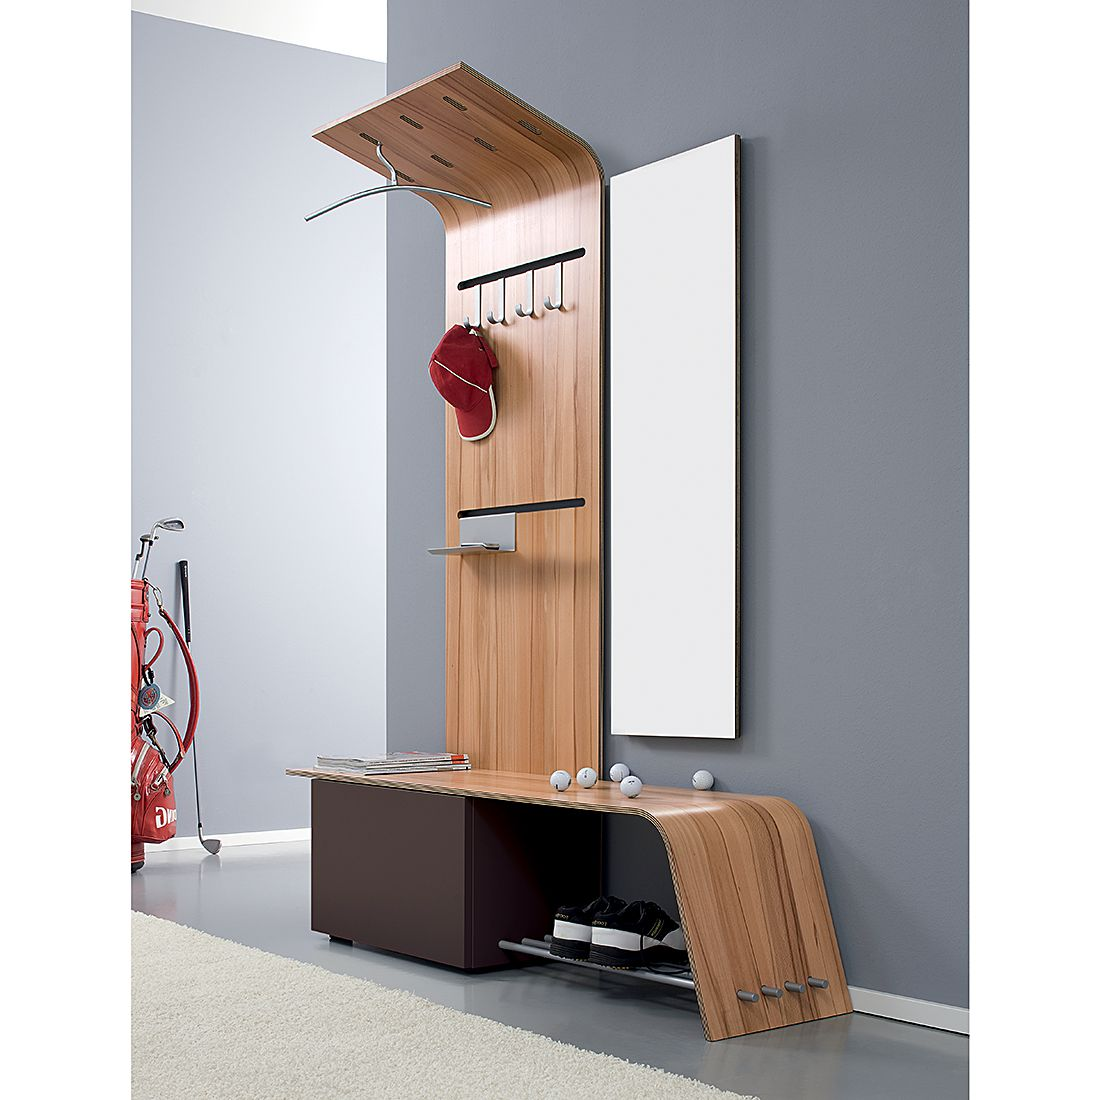 garderobe elli paneel ausrichtung links kernbuche. Black Bedroom Furniture Sets. Home Design Ideas